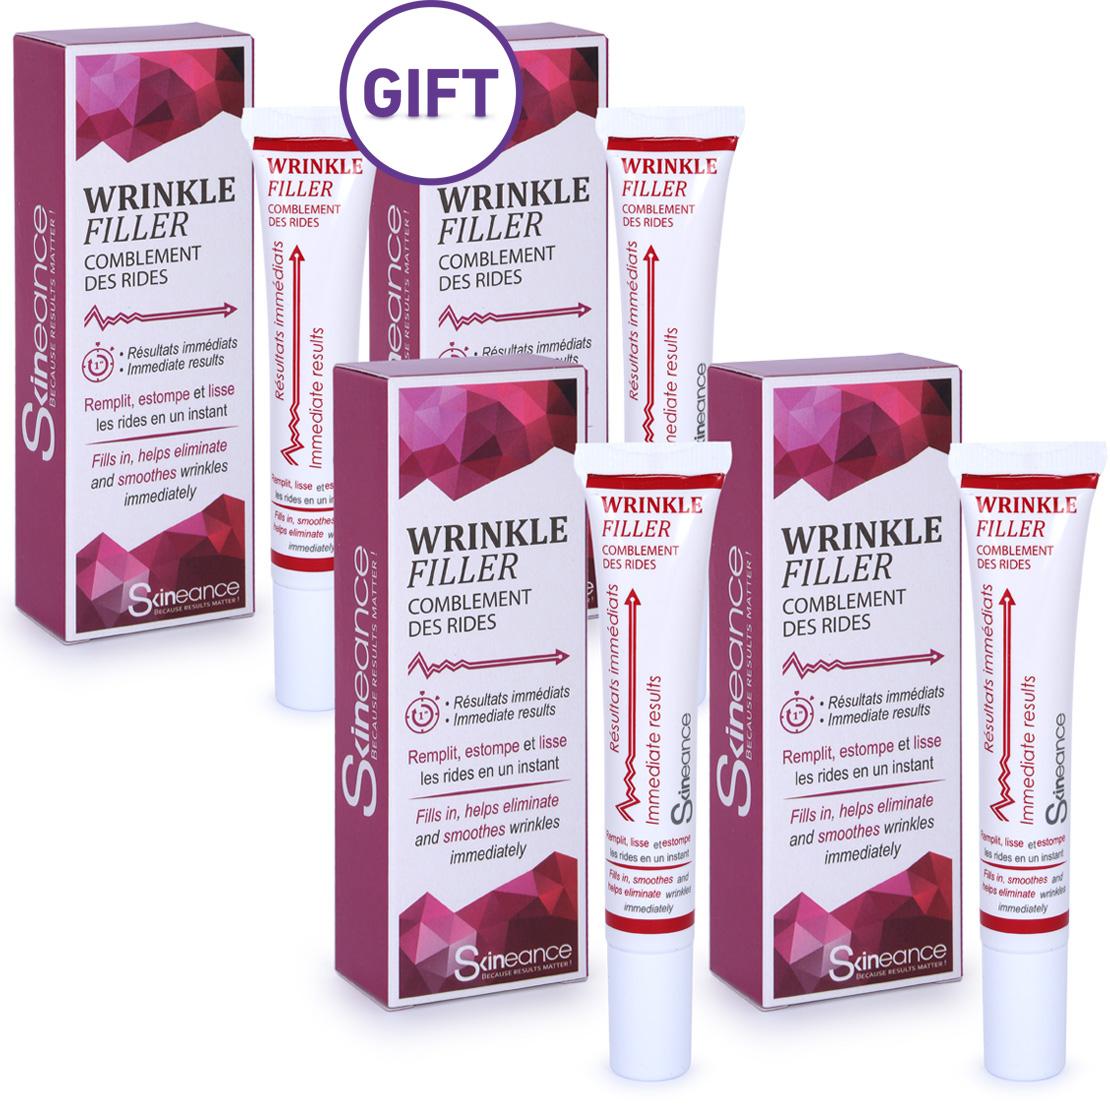 Wrinkle Filler - Buy 2  & Get 2 Free